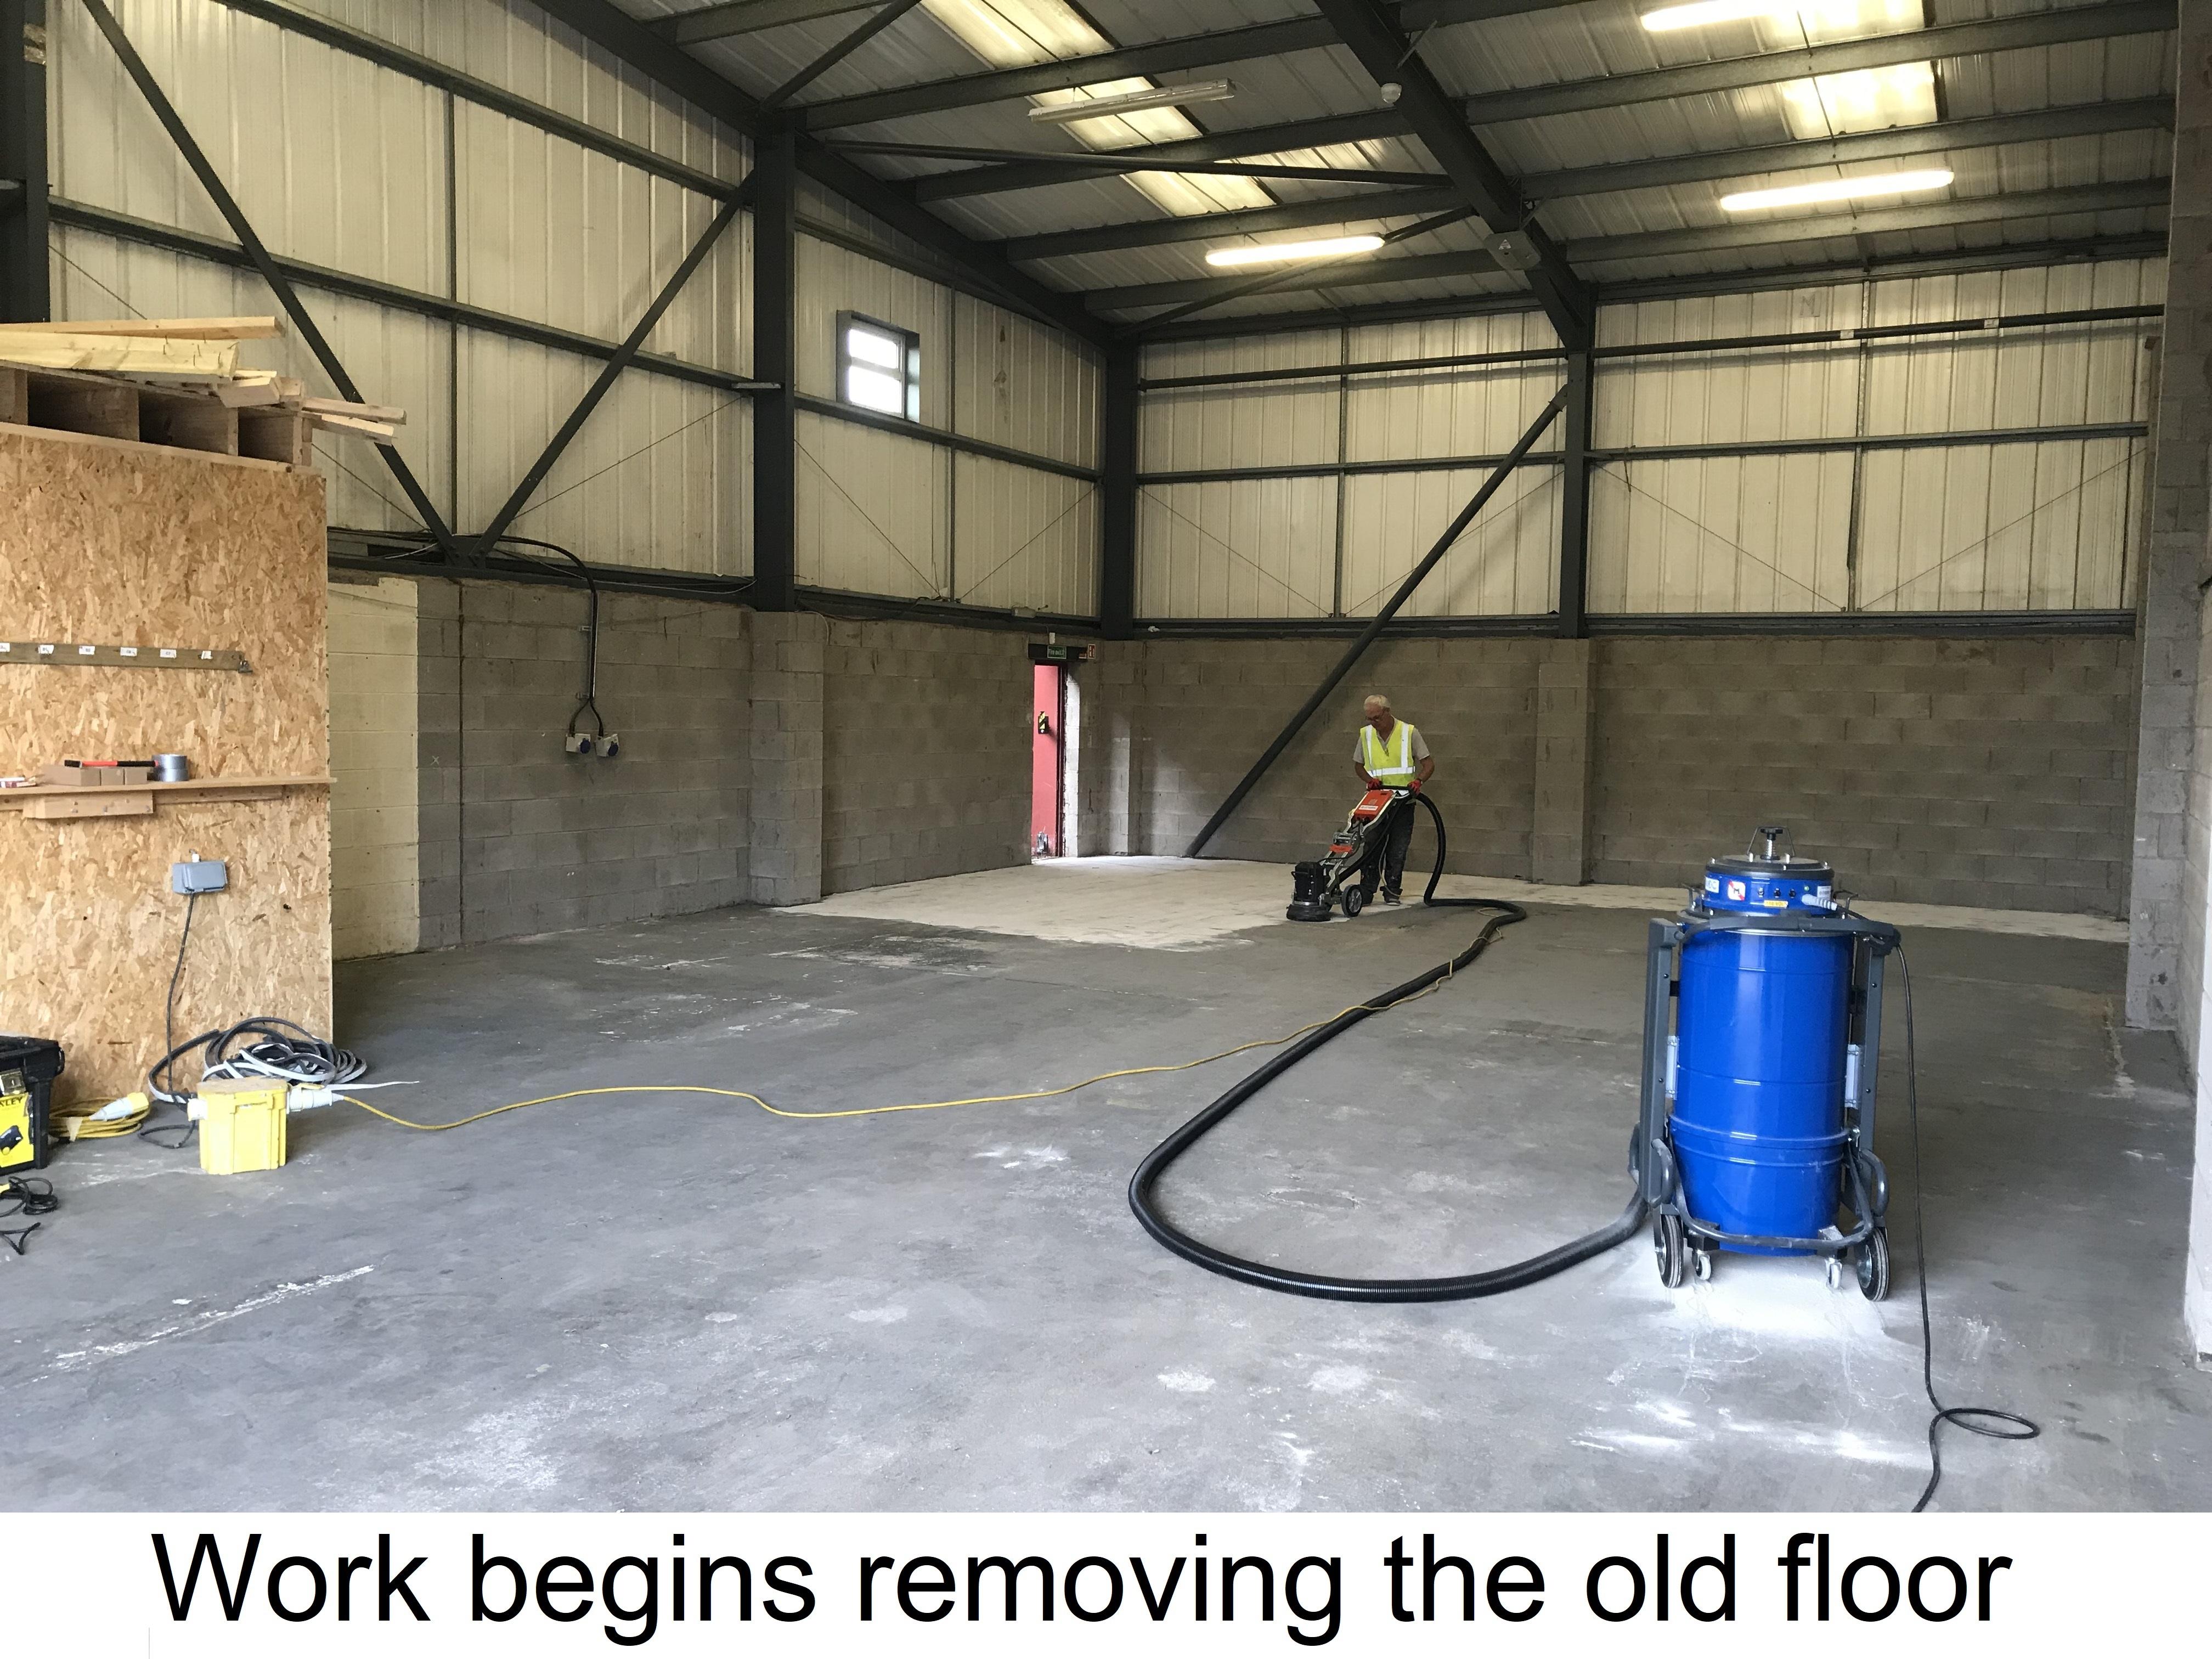 https://0201.nccdn.net/1_2/000/000/0e0/a25/2.-work-begins-removing-the-old-floor.jpg